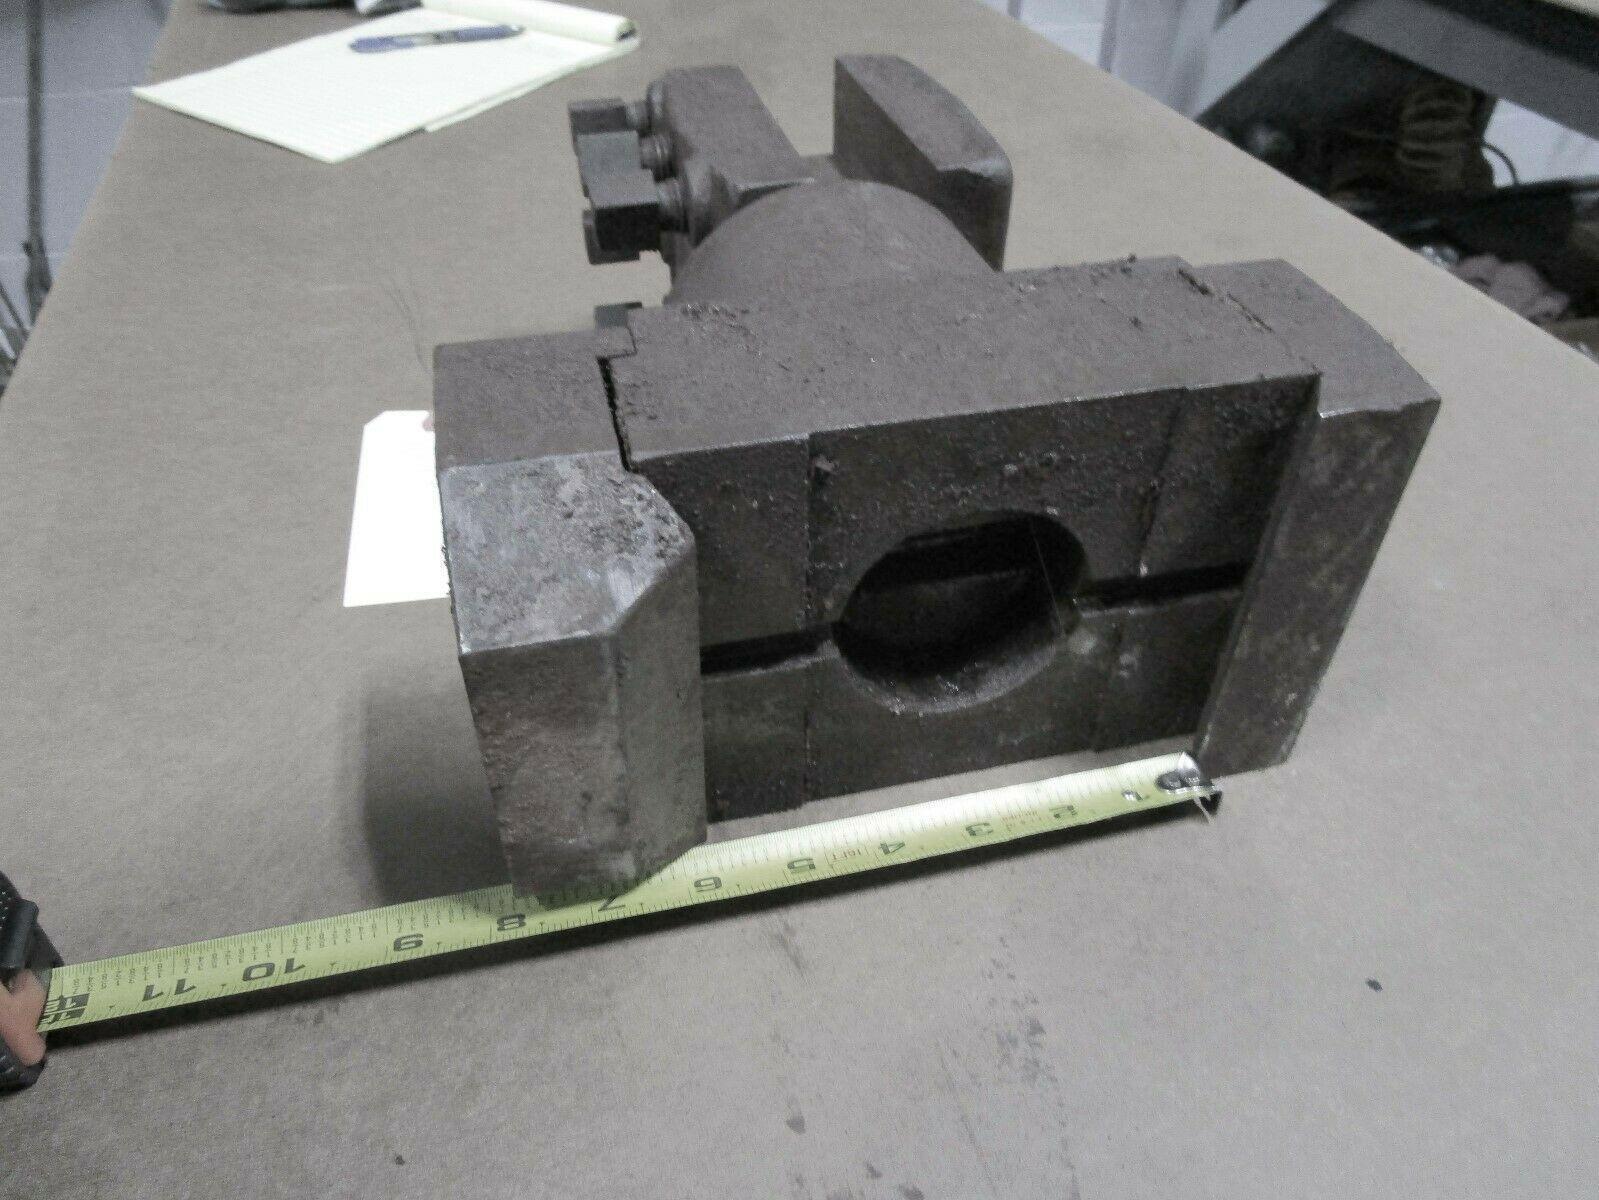 "Bullard Dynautrol Dynautape 6"" Dove Tail Tool Block w/ 3-side slick tool holder"